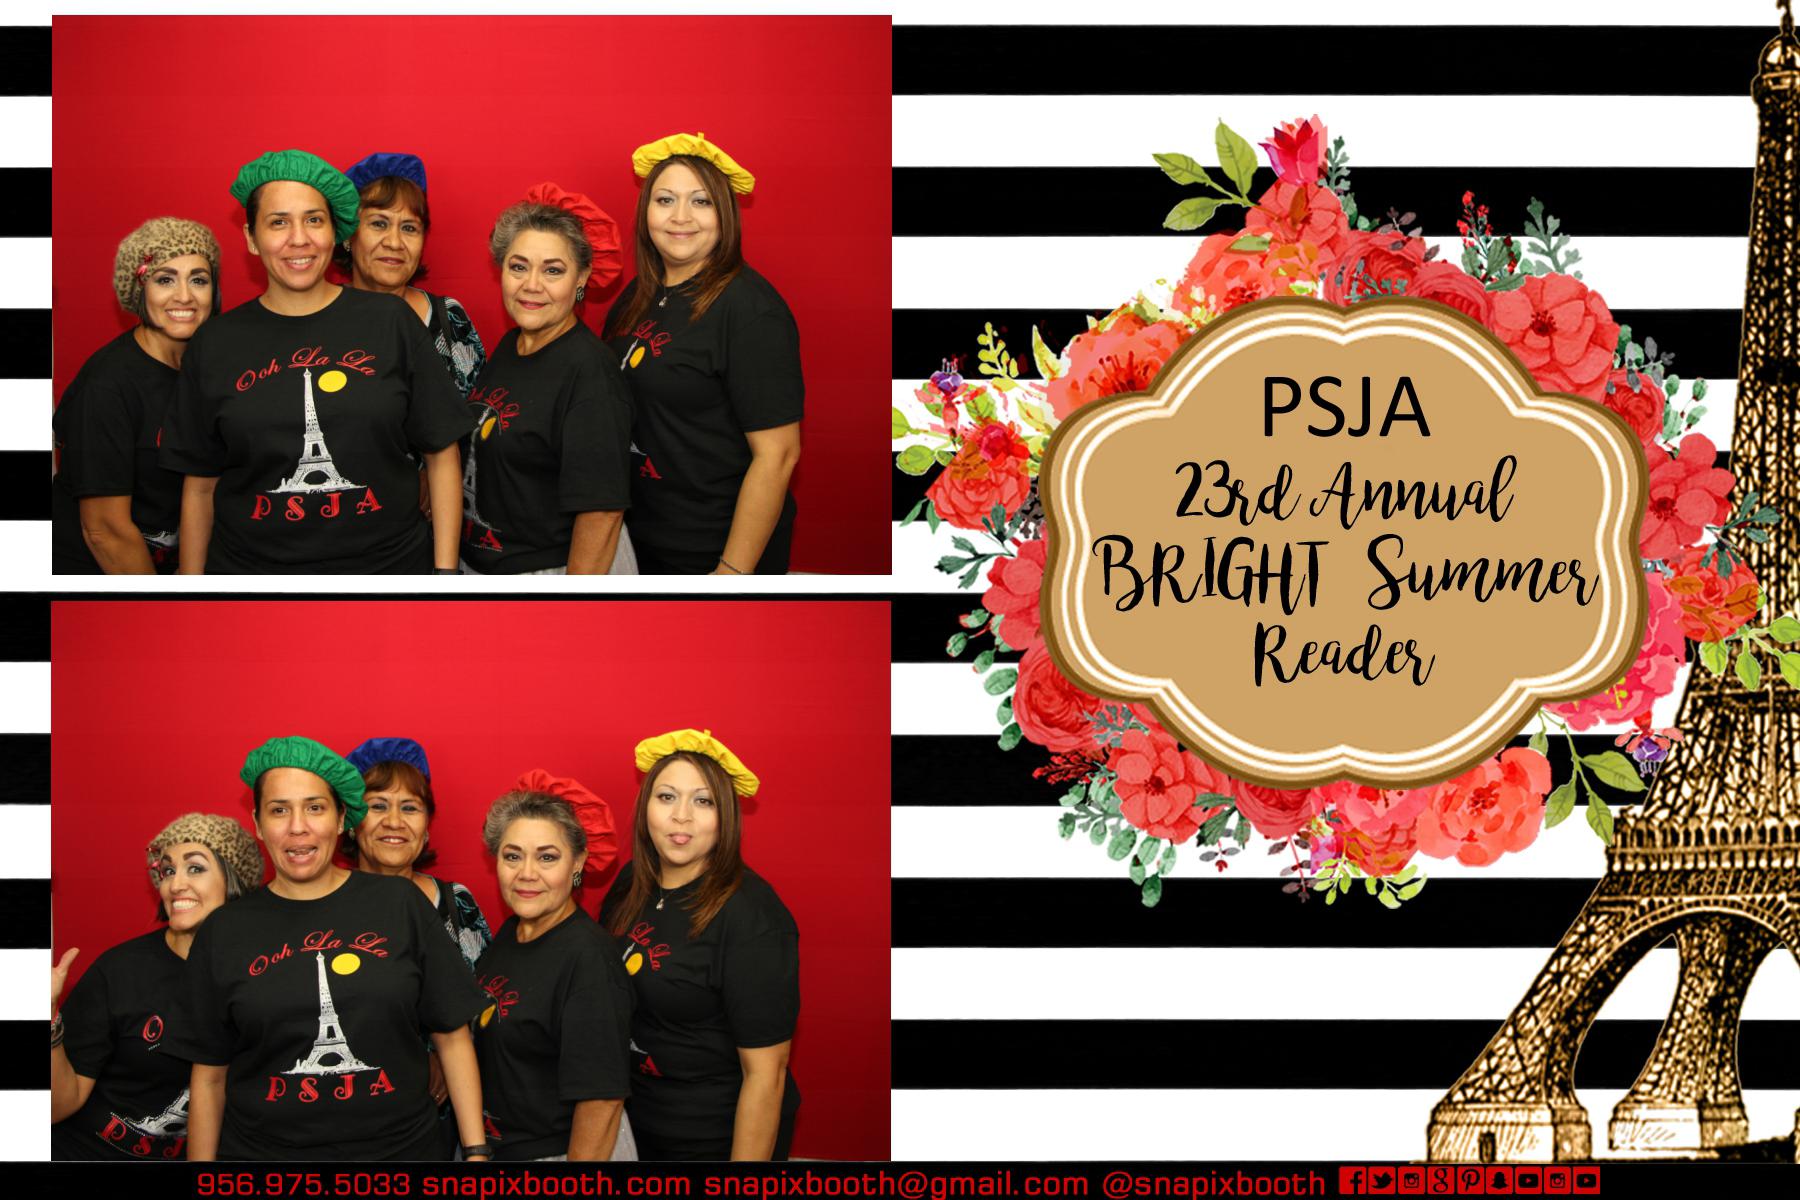 PSJA 23rd Annual BRIGHT Summer Reade